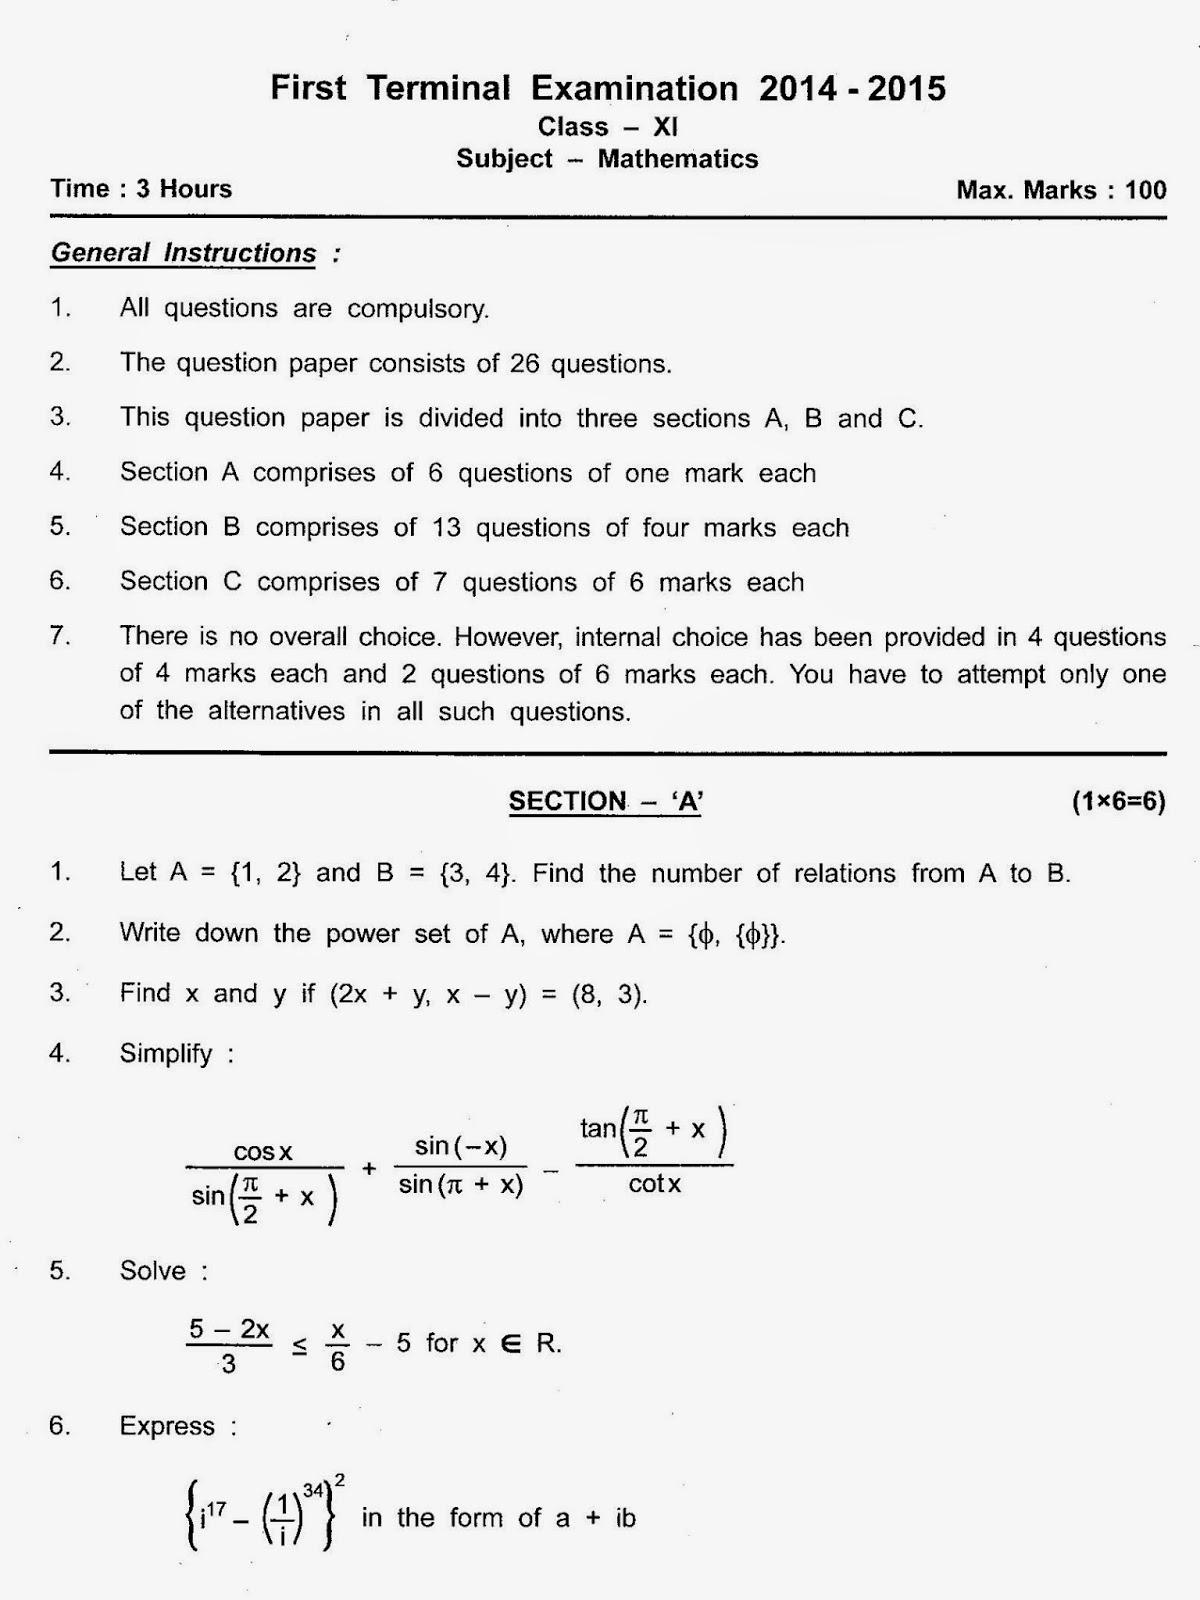 Maths4all class xi amity international school question paper first class xi amity international school question paper first term paper 2014 malvernweather Gallery